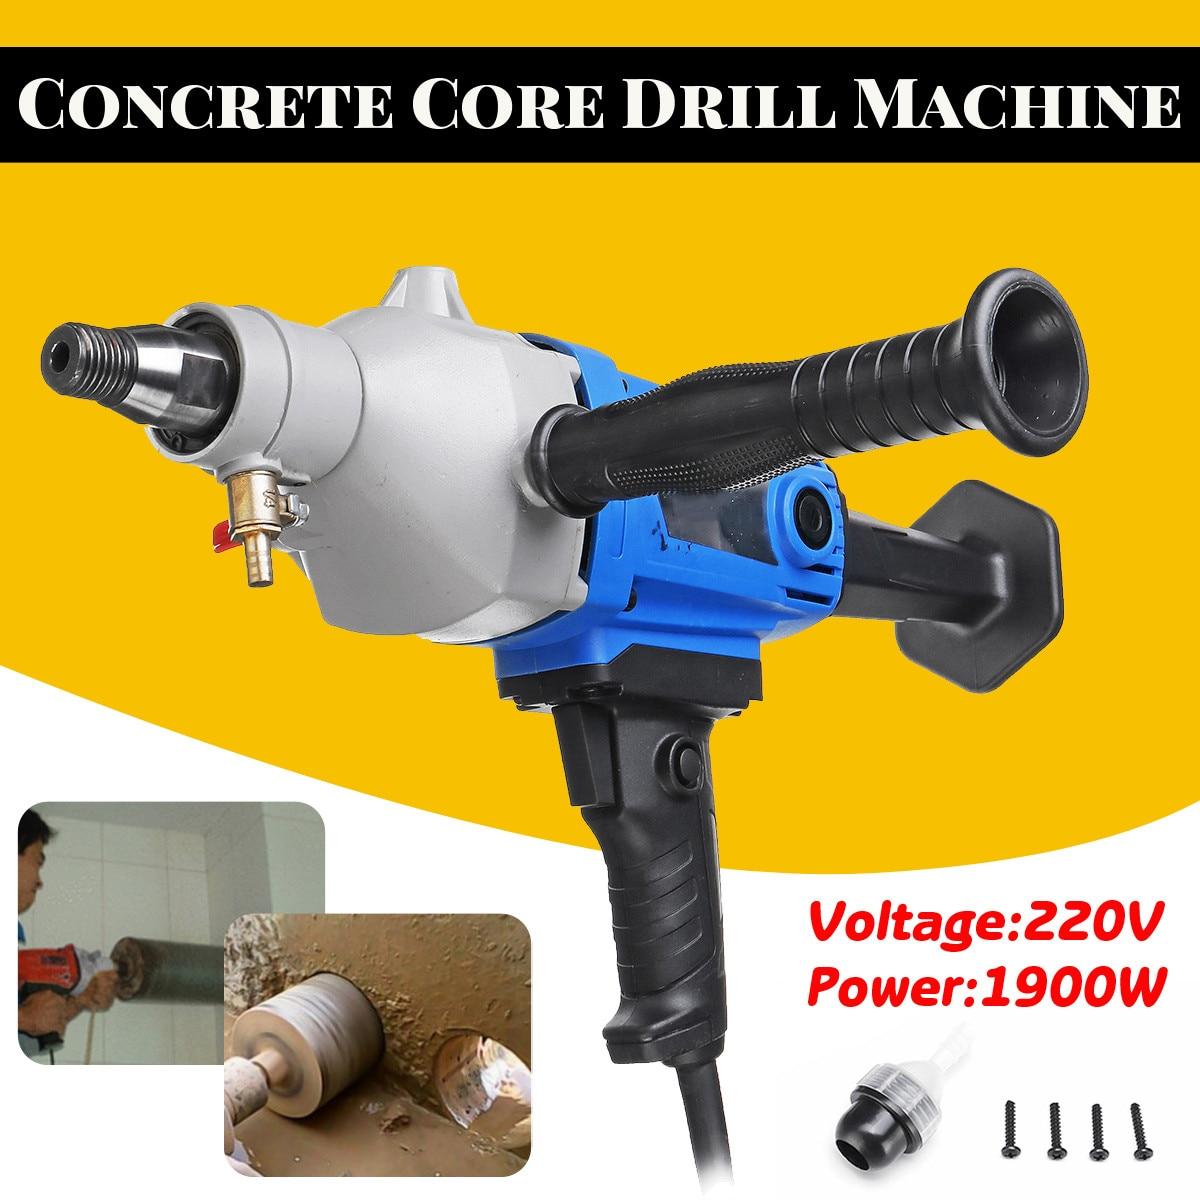 220V 1900W 118mm Diamond Core Drill Wet Handheld Concrete Core Drilling Machine With Water Pump Accessories